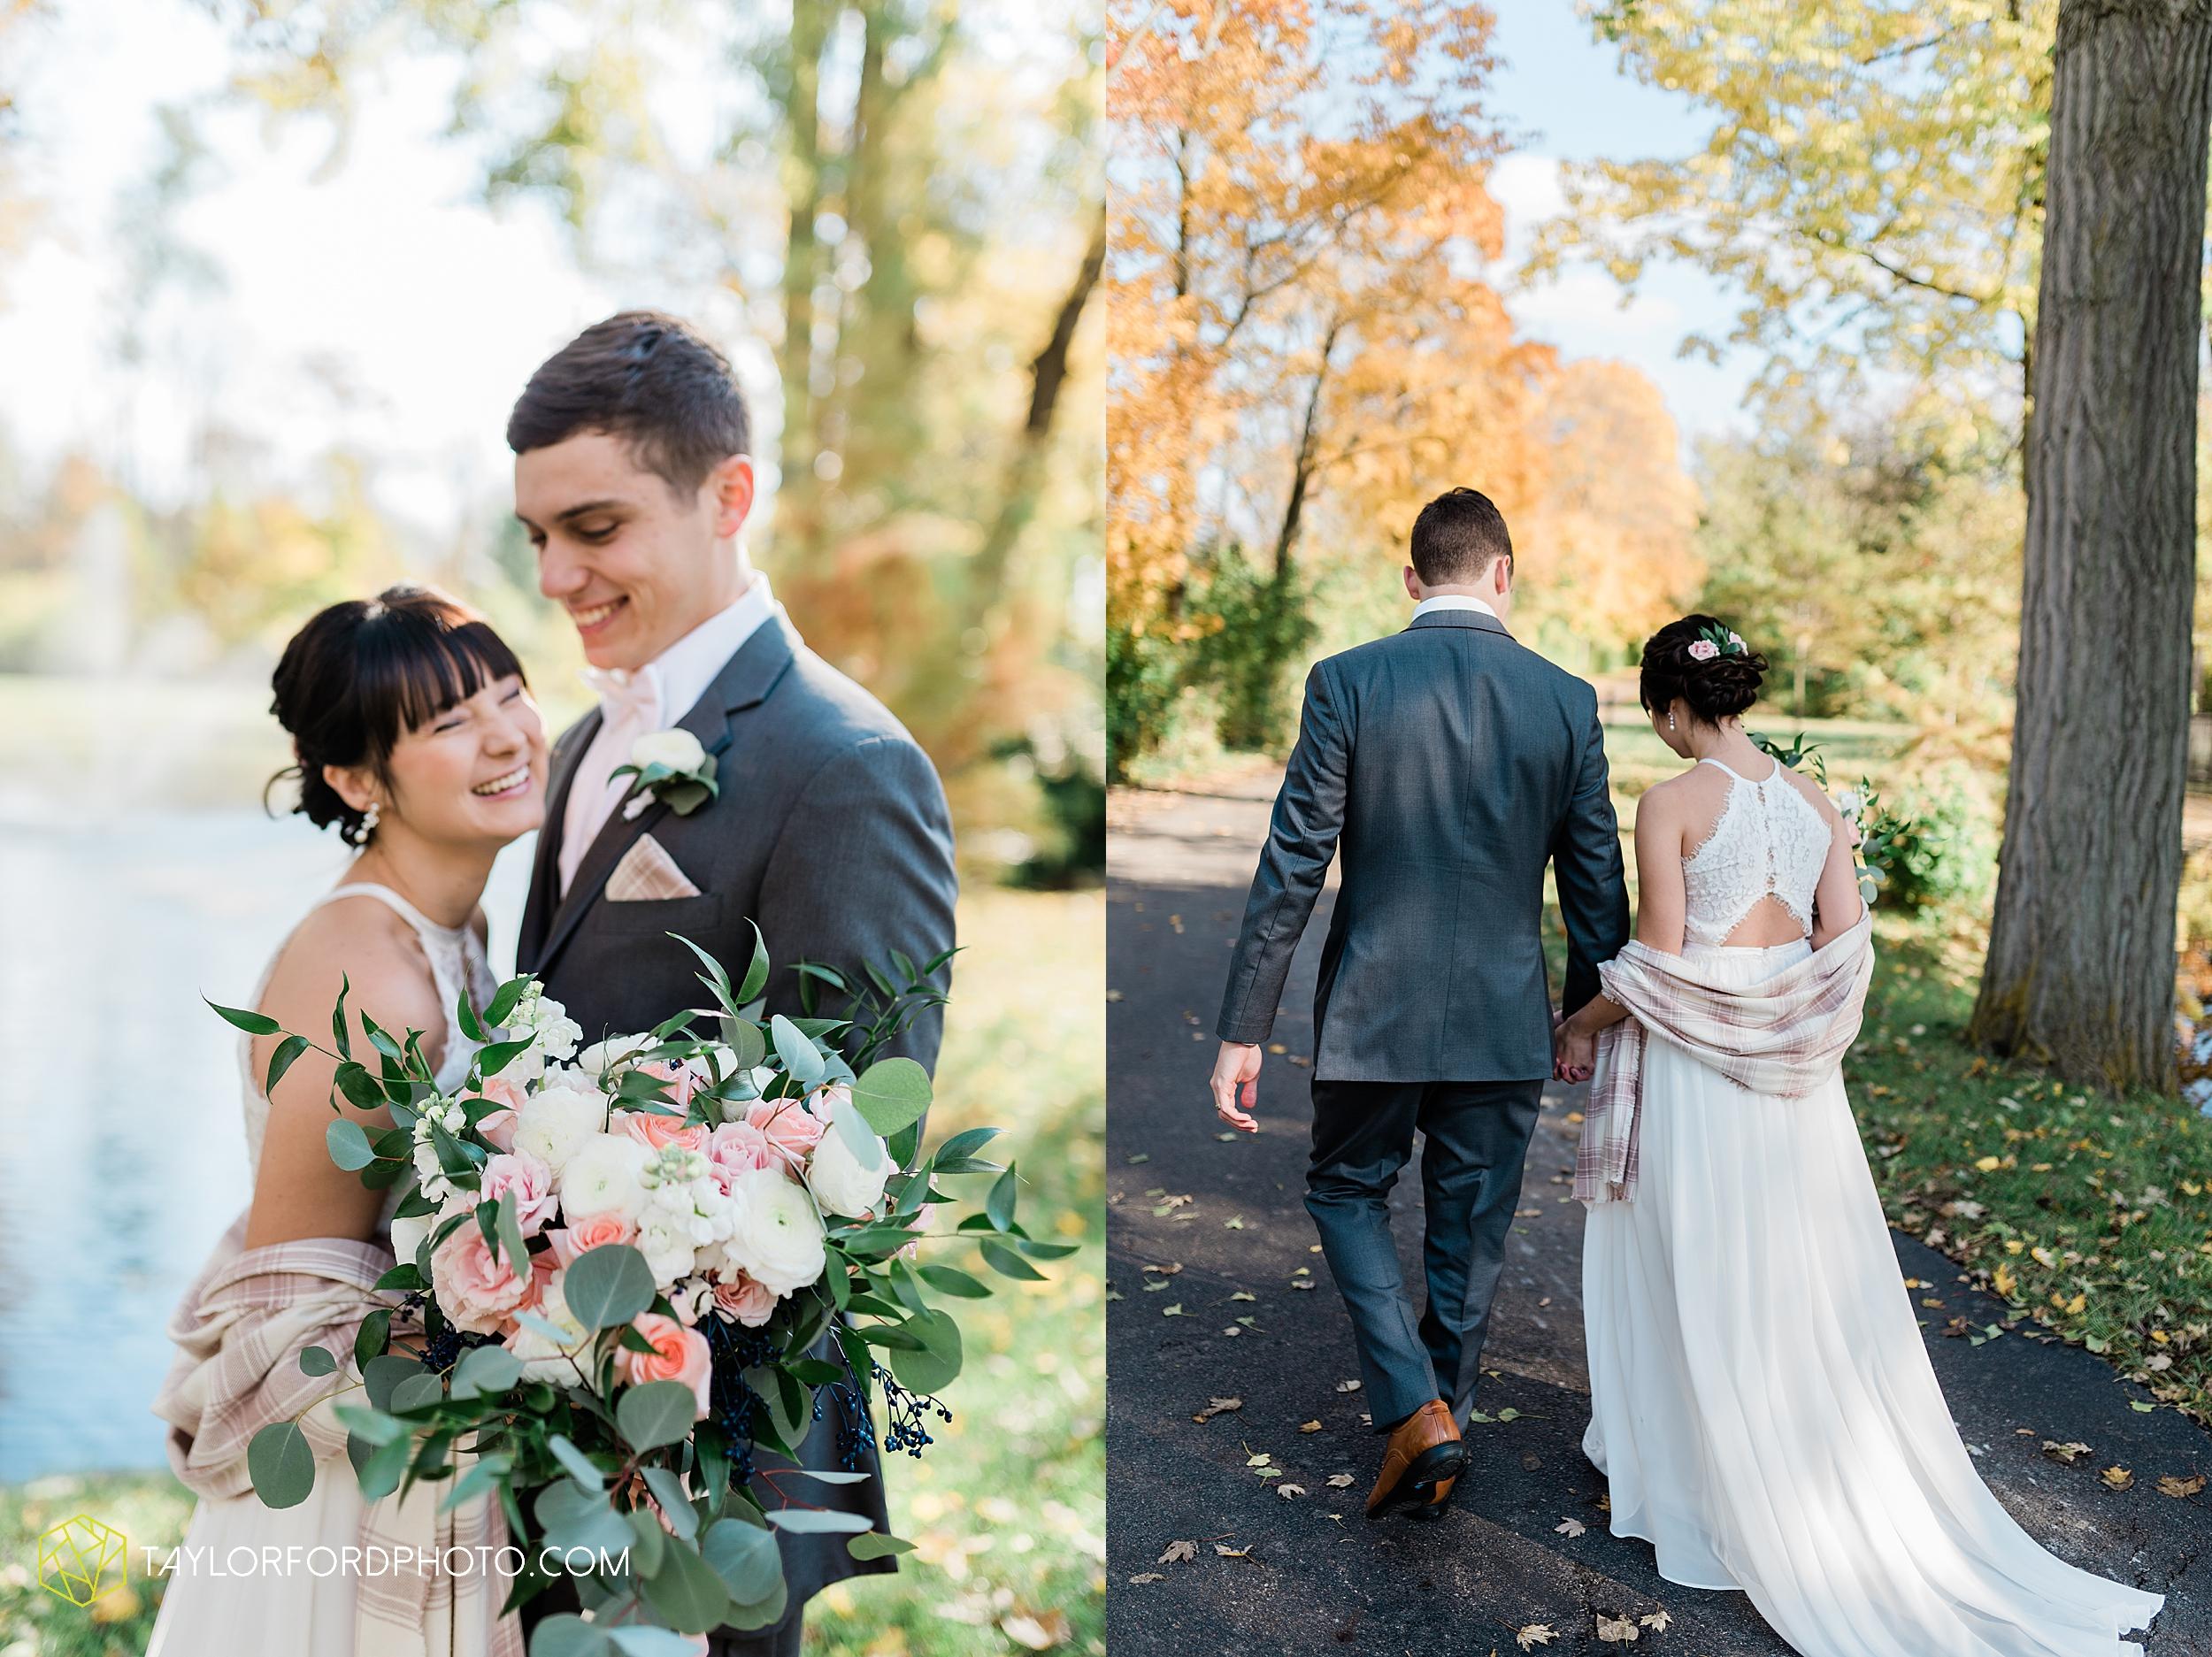 marissa-nicole-nick-daeger-orrmont-estate-farm-wedding-piqua-dayton-troy-ohio-fall-photographer-taylor-ford-photography_1509.jpg